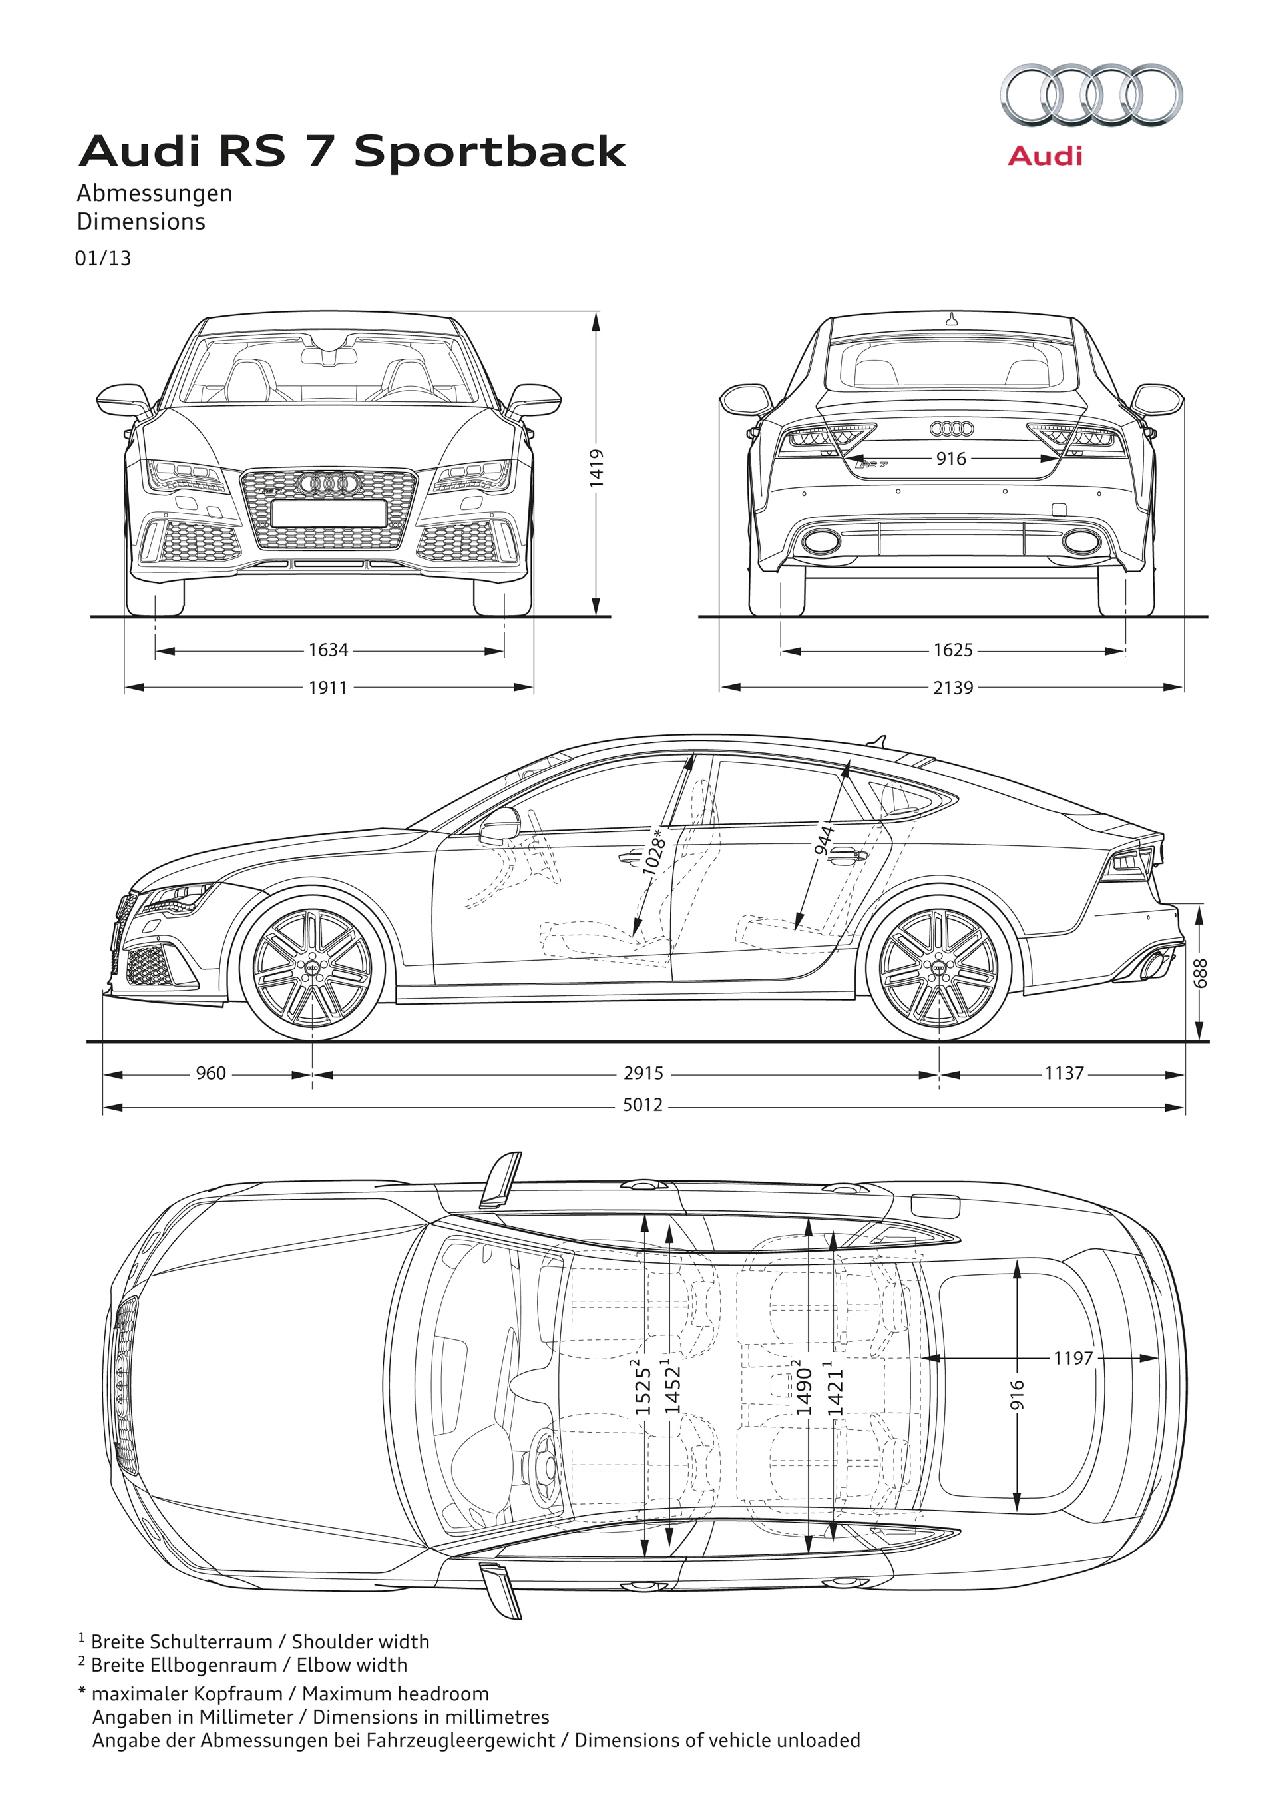 Nuevo Audi Rs7 Sportback Debut En Detroit